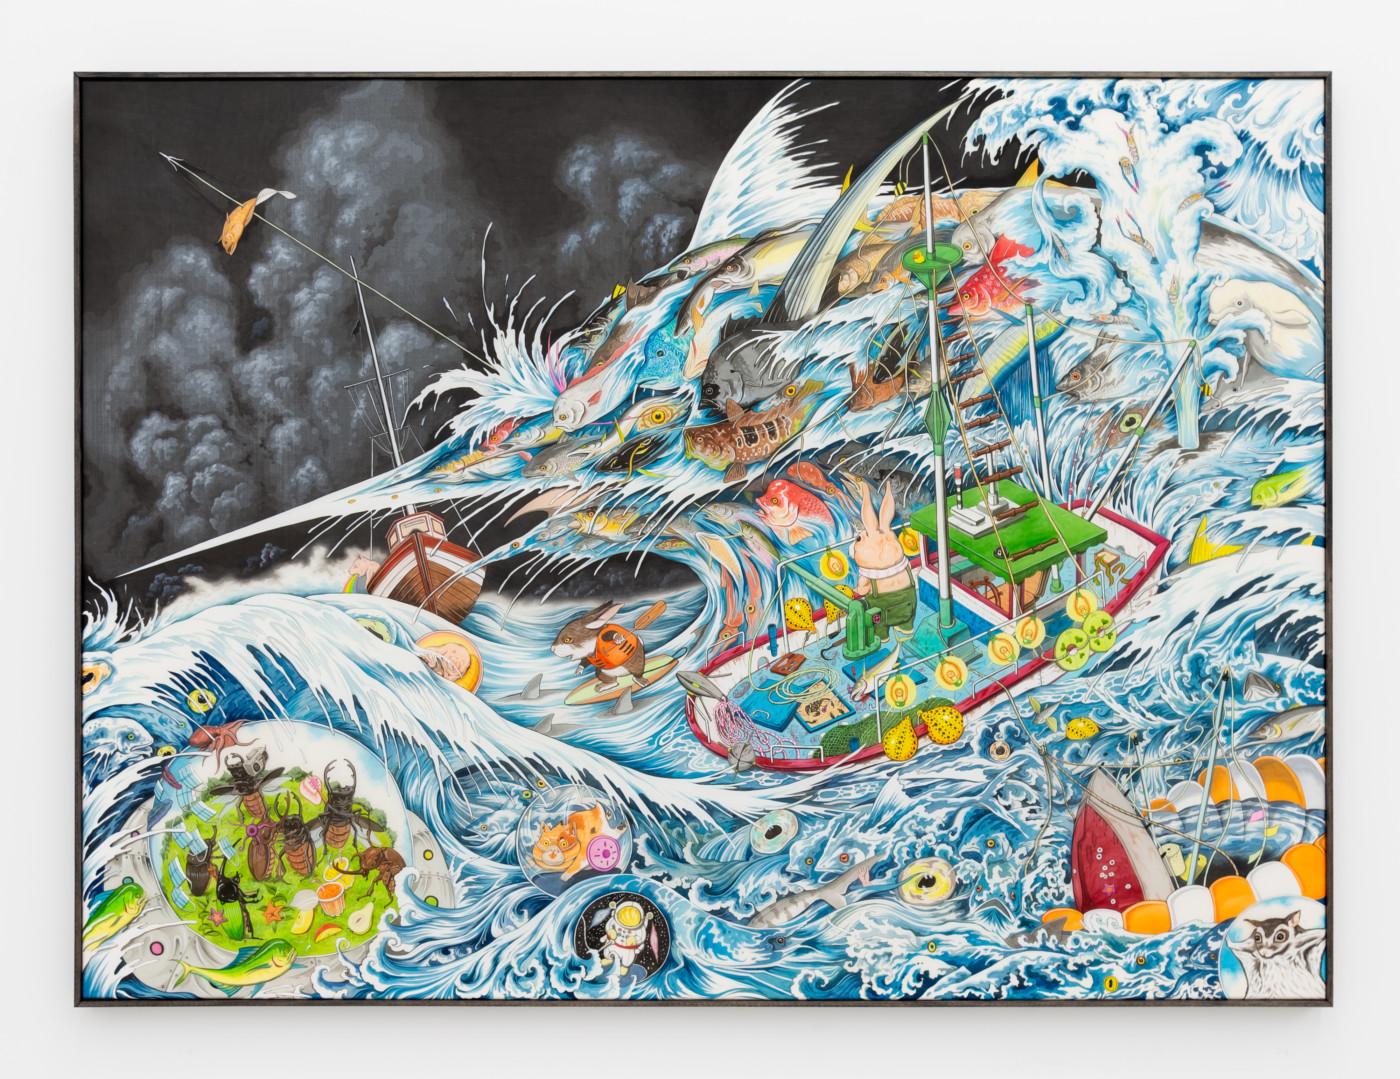 HUN KYU KIM  Slippery Mass,  2020 Pigment painted on silk 105 x 130 cm / 41 3/8 x 51 1/8 in - High Art Gallery Paris